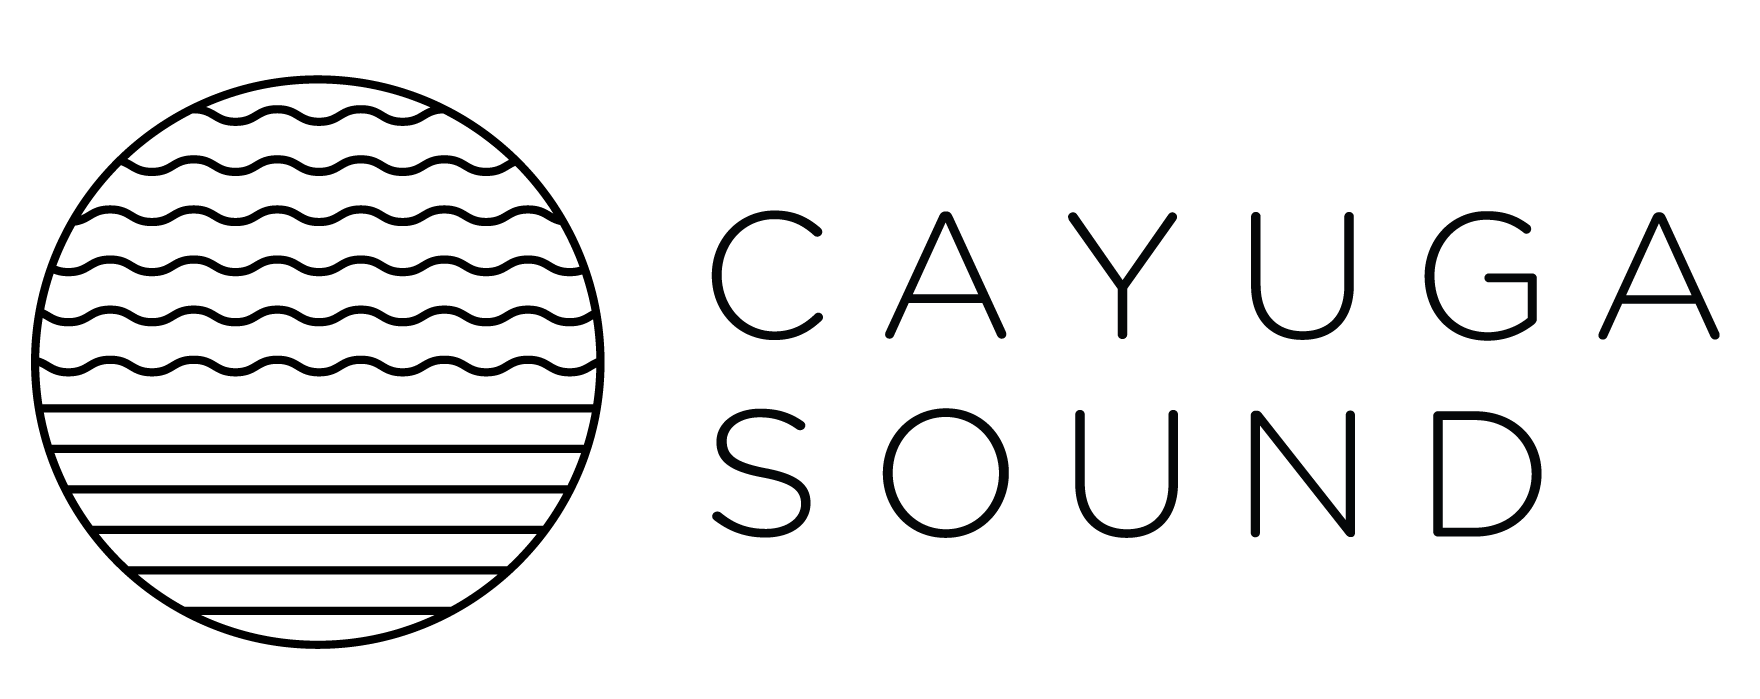 Cayuga_Logos_Final-HL-02.png